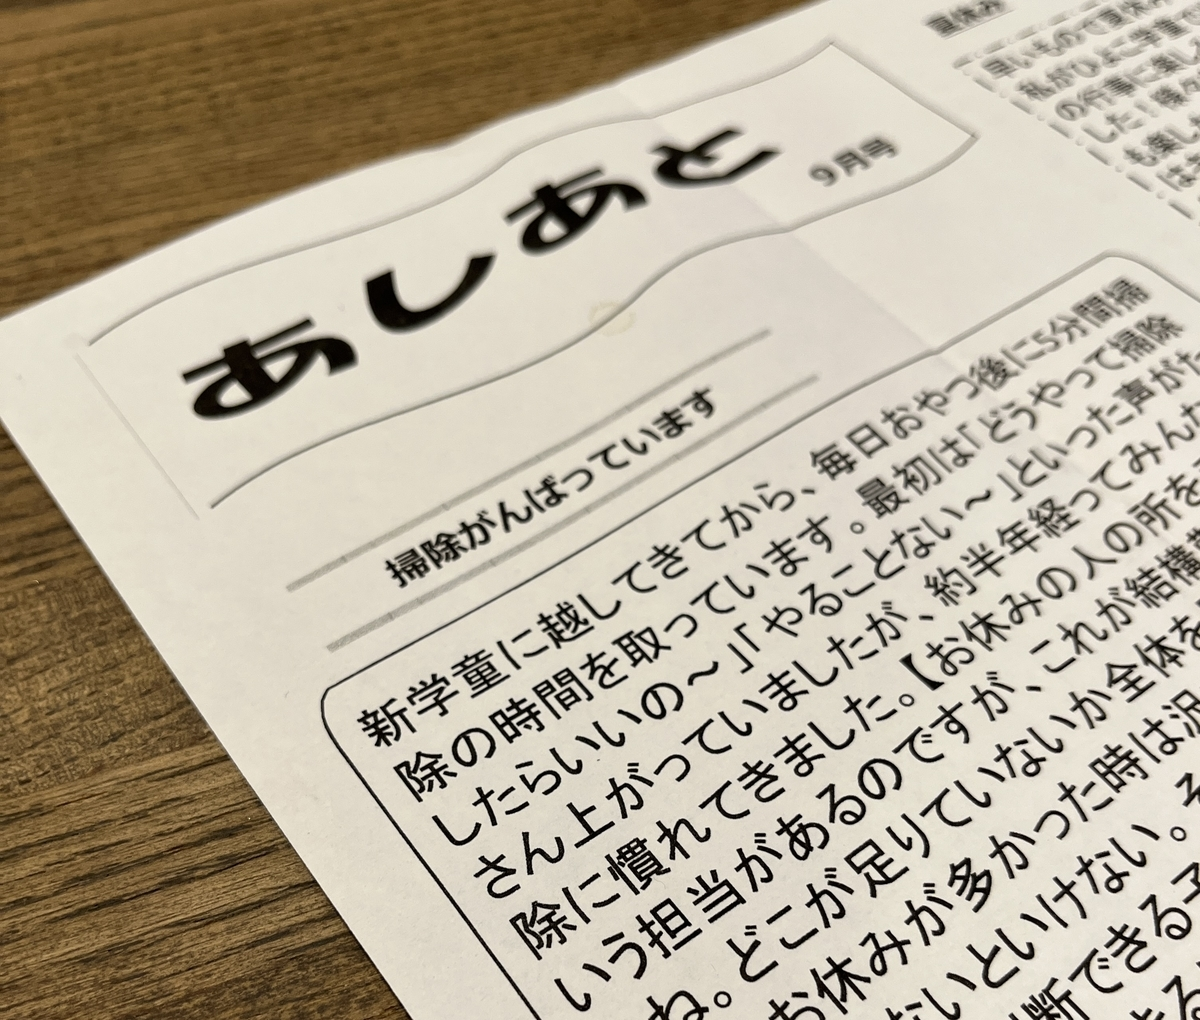 f:id:hiyoko_gakudou:20211003174729j:plain